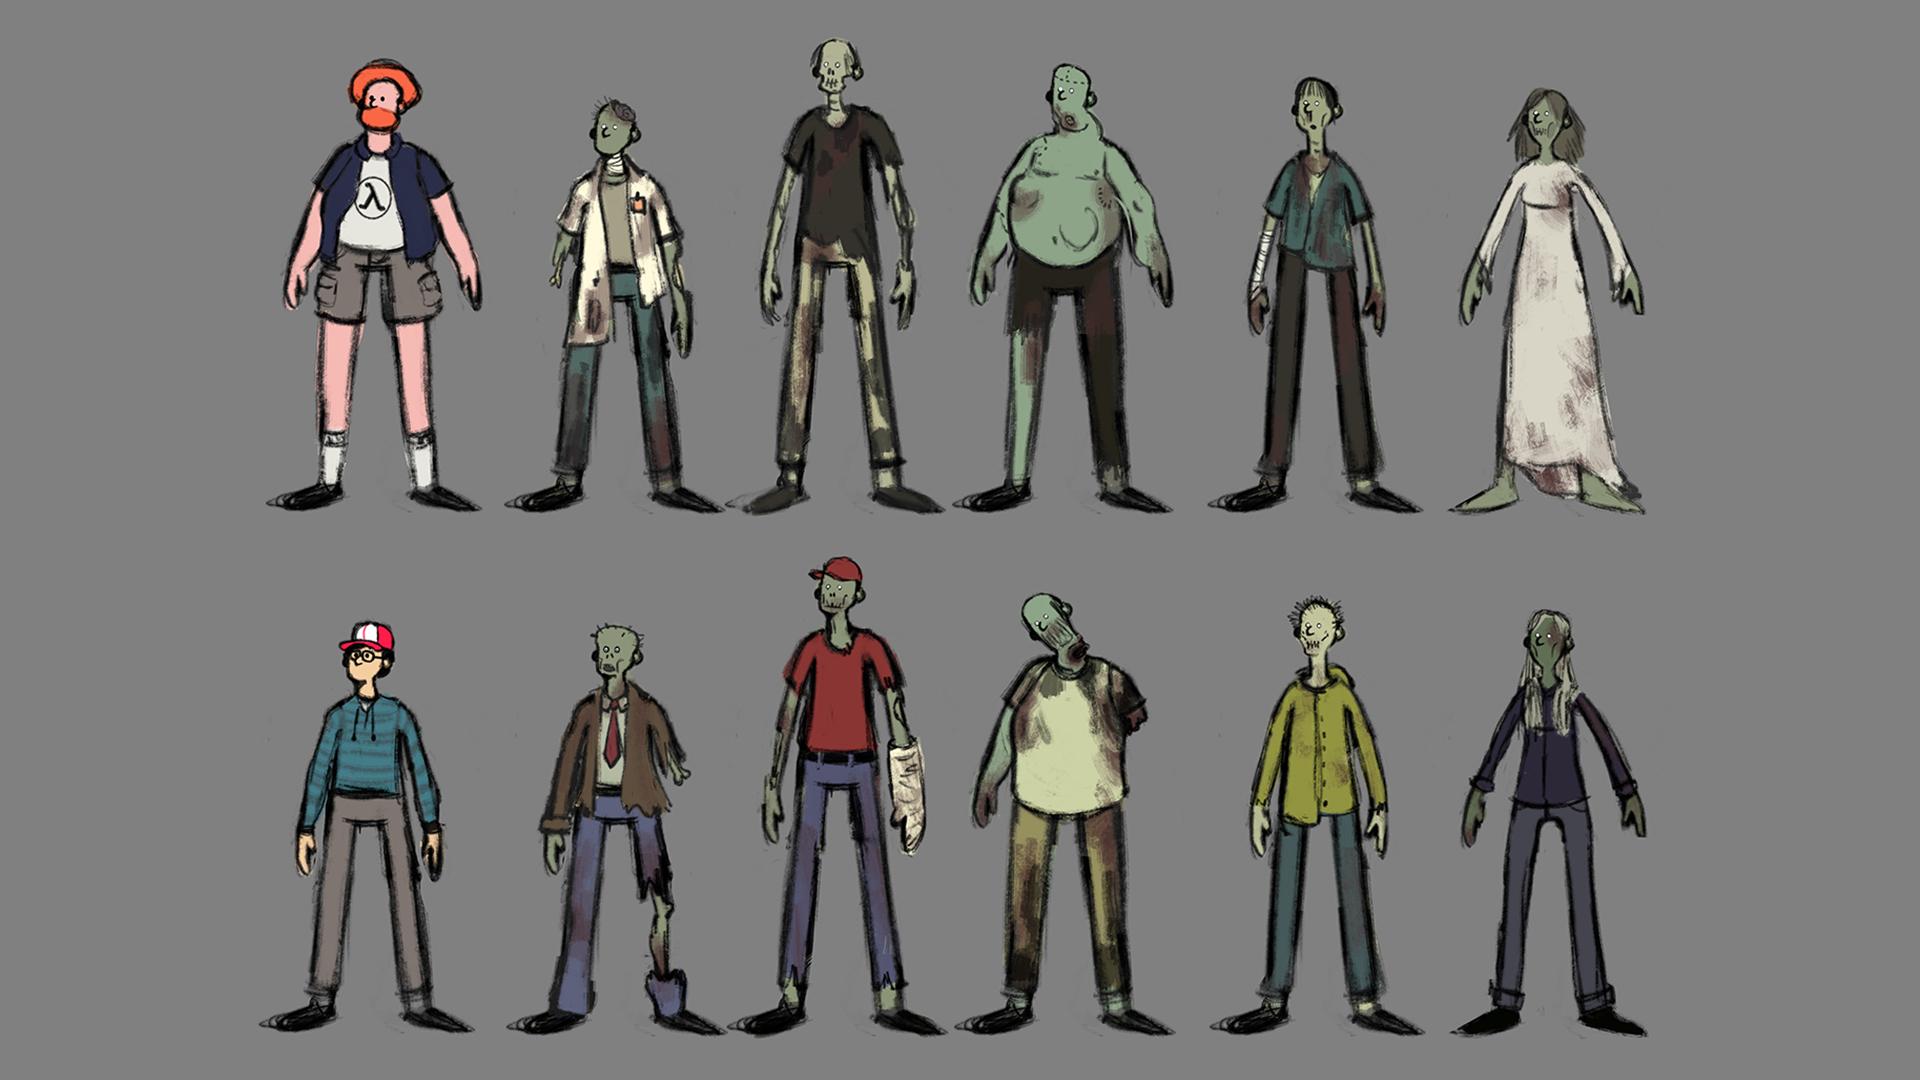 Paypal_Calabash_Design_Zombies_Characters.jpg